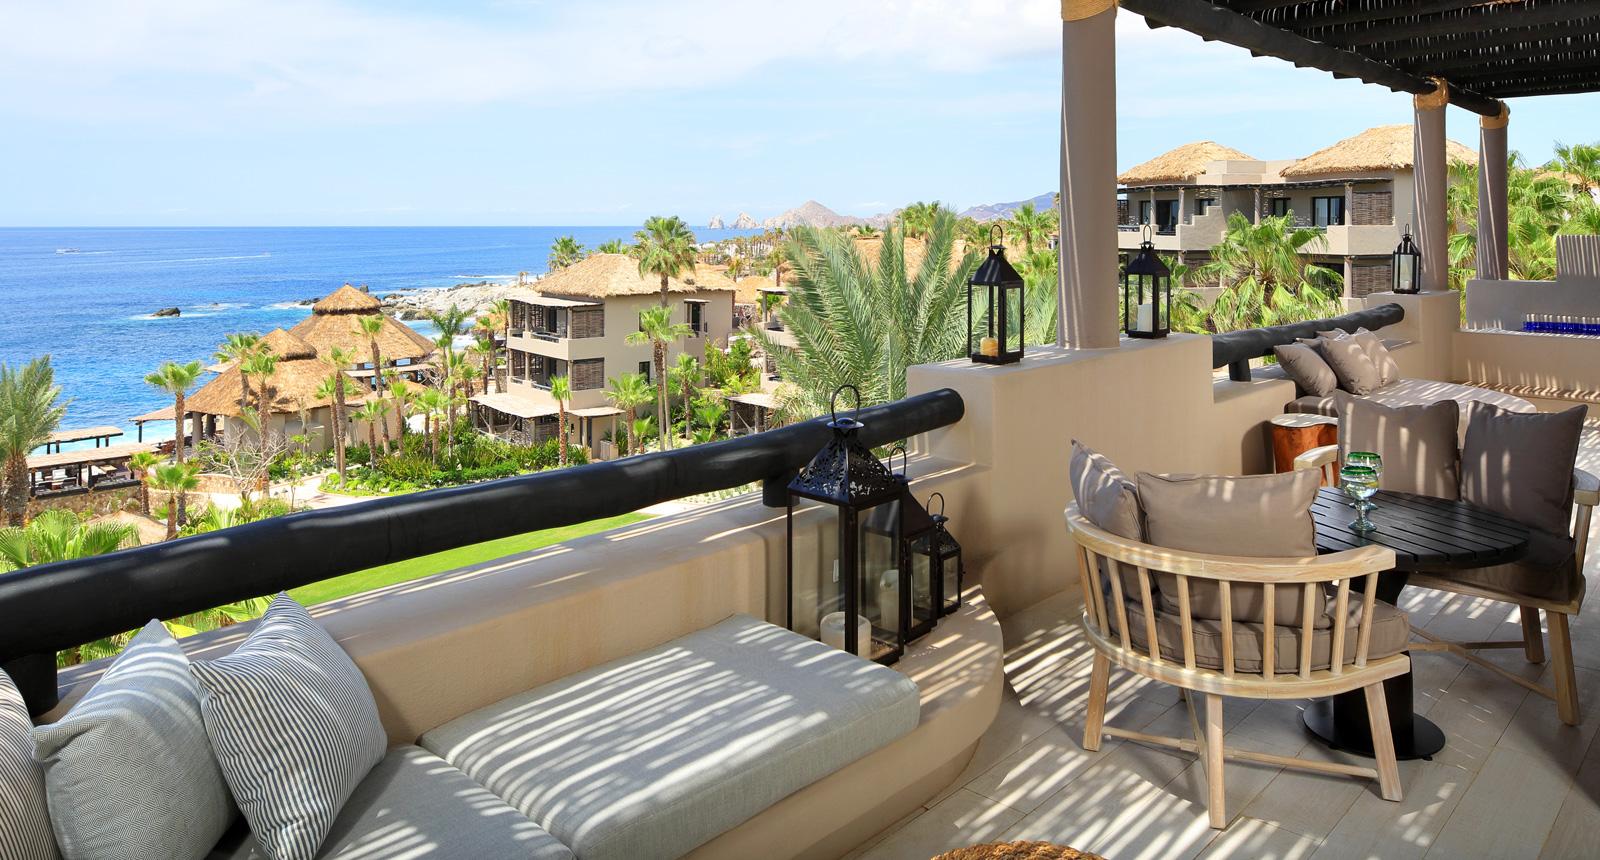 Courtesy Of Esperanza An Auberge Resort